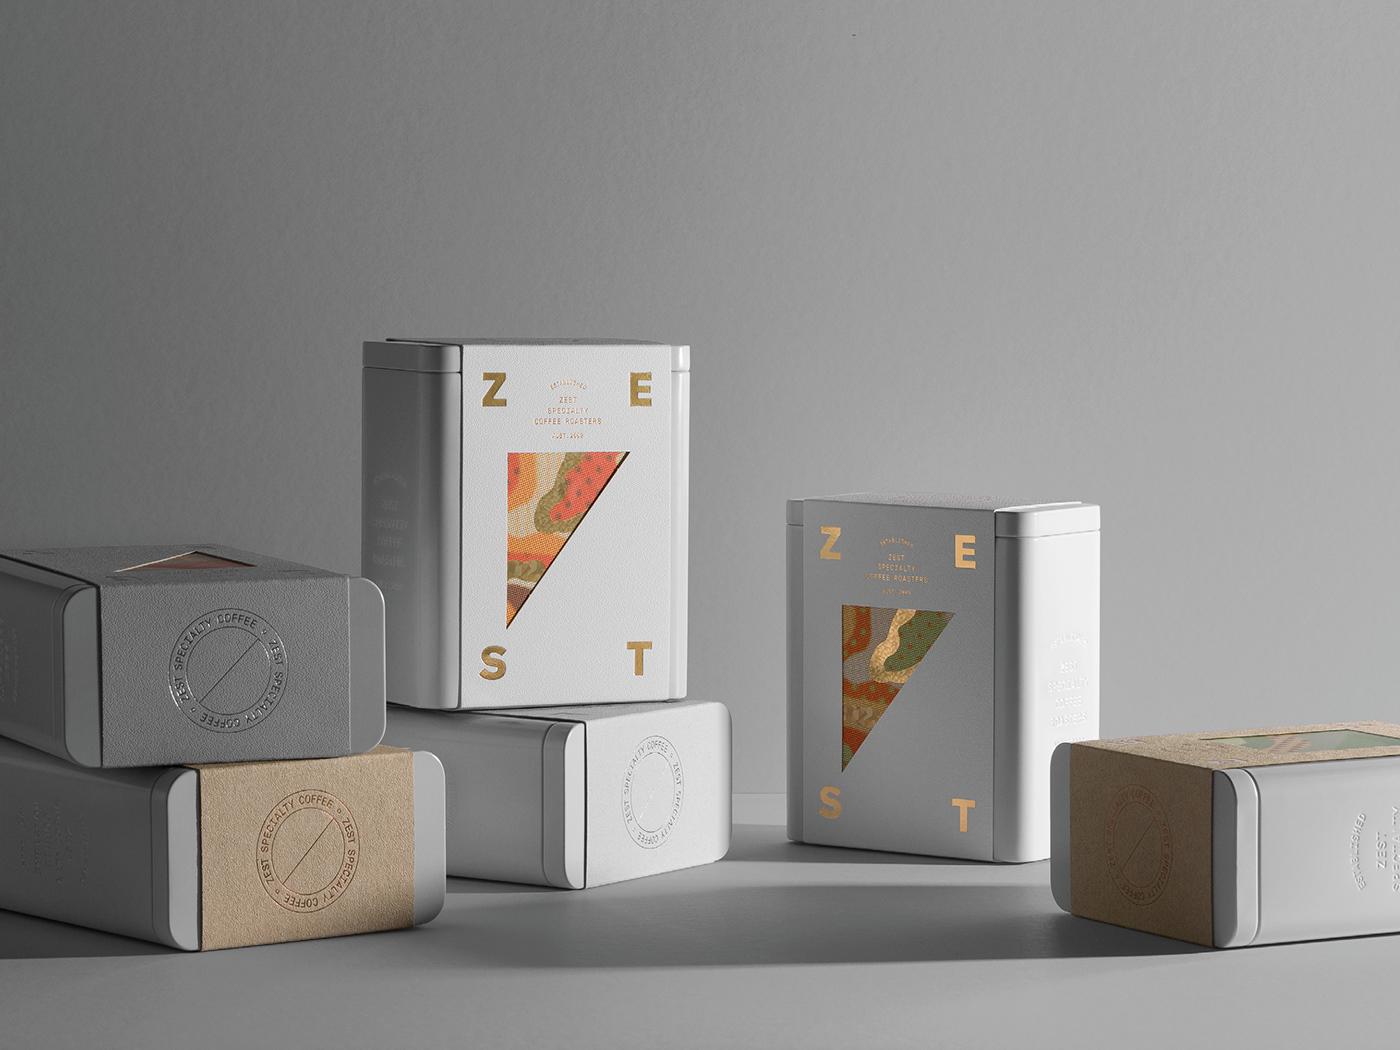 Image may contain: box and book